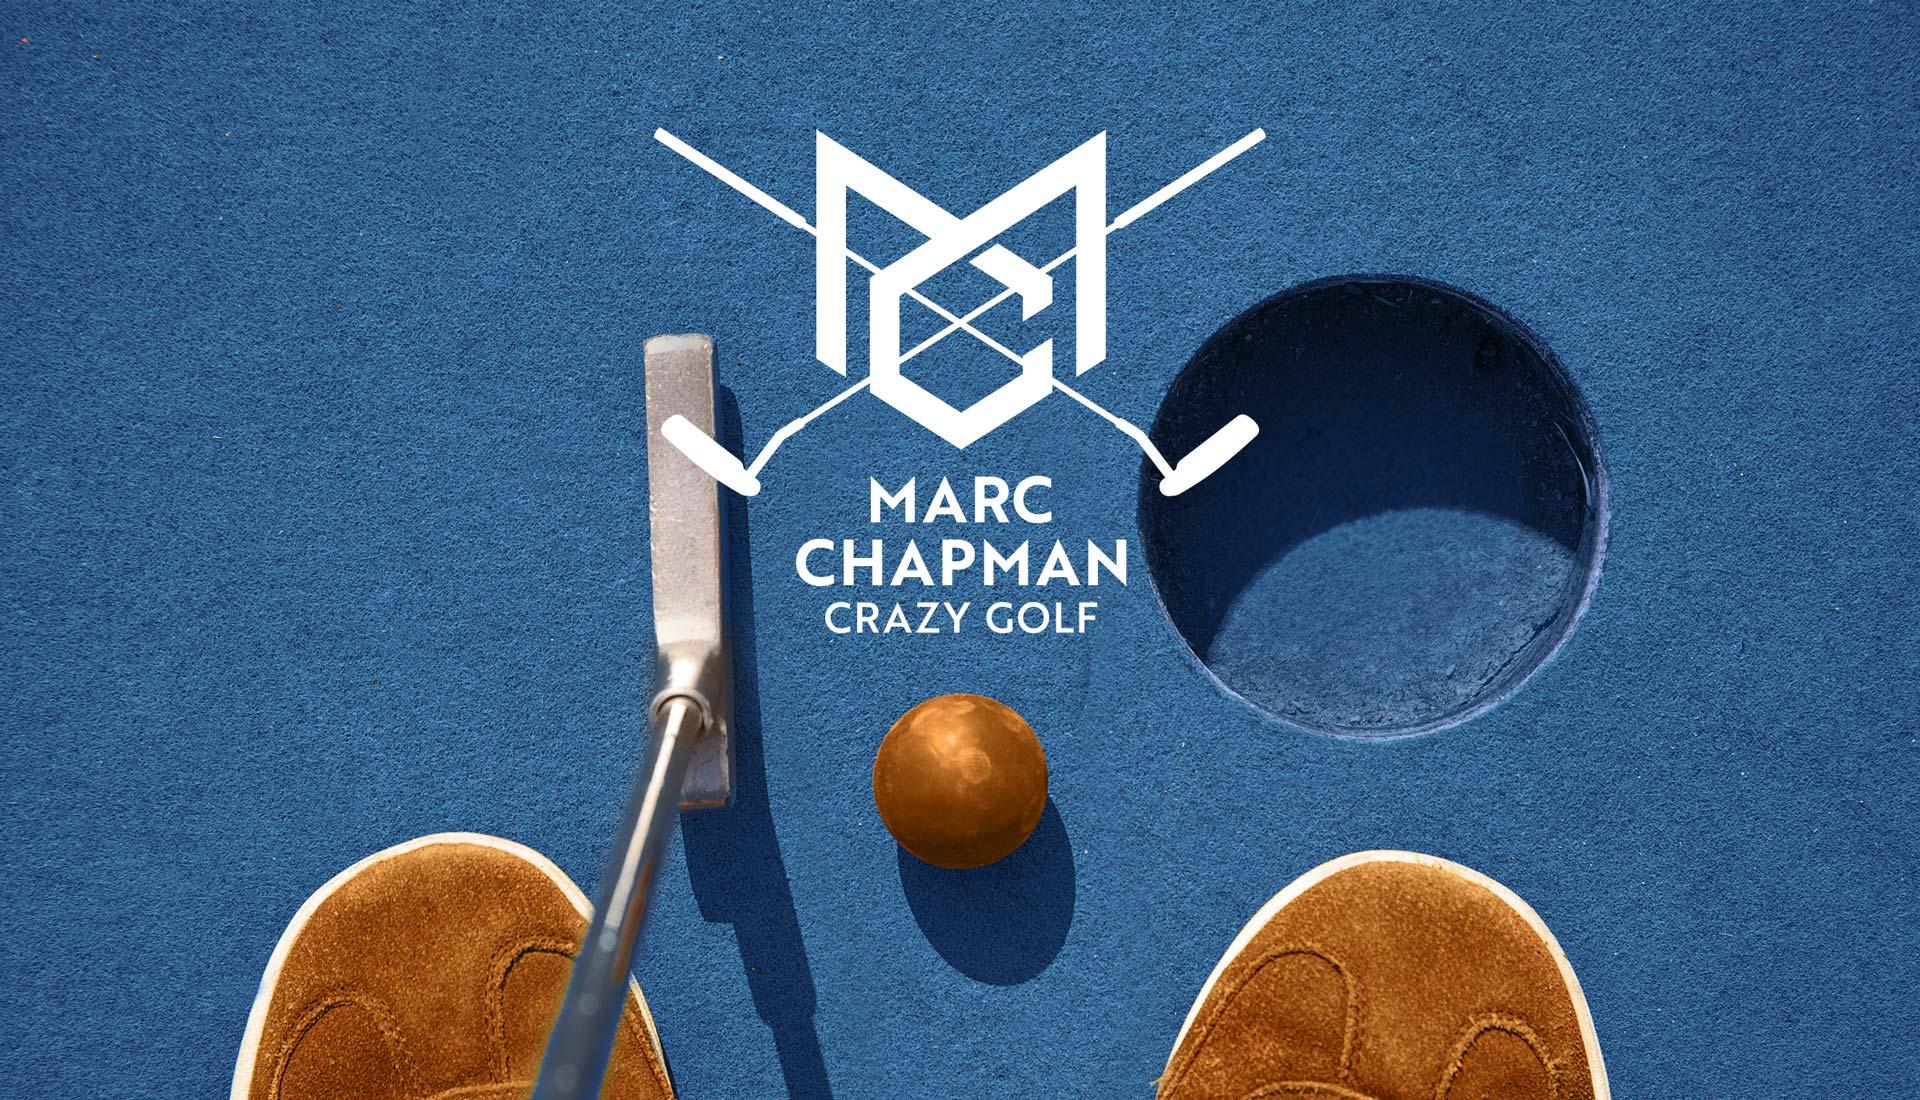 Marc Chapman Crazy Golf World Champion